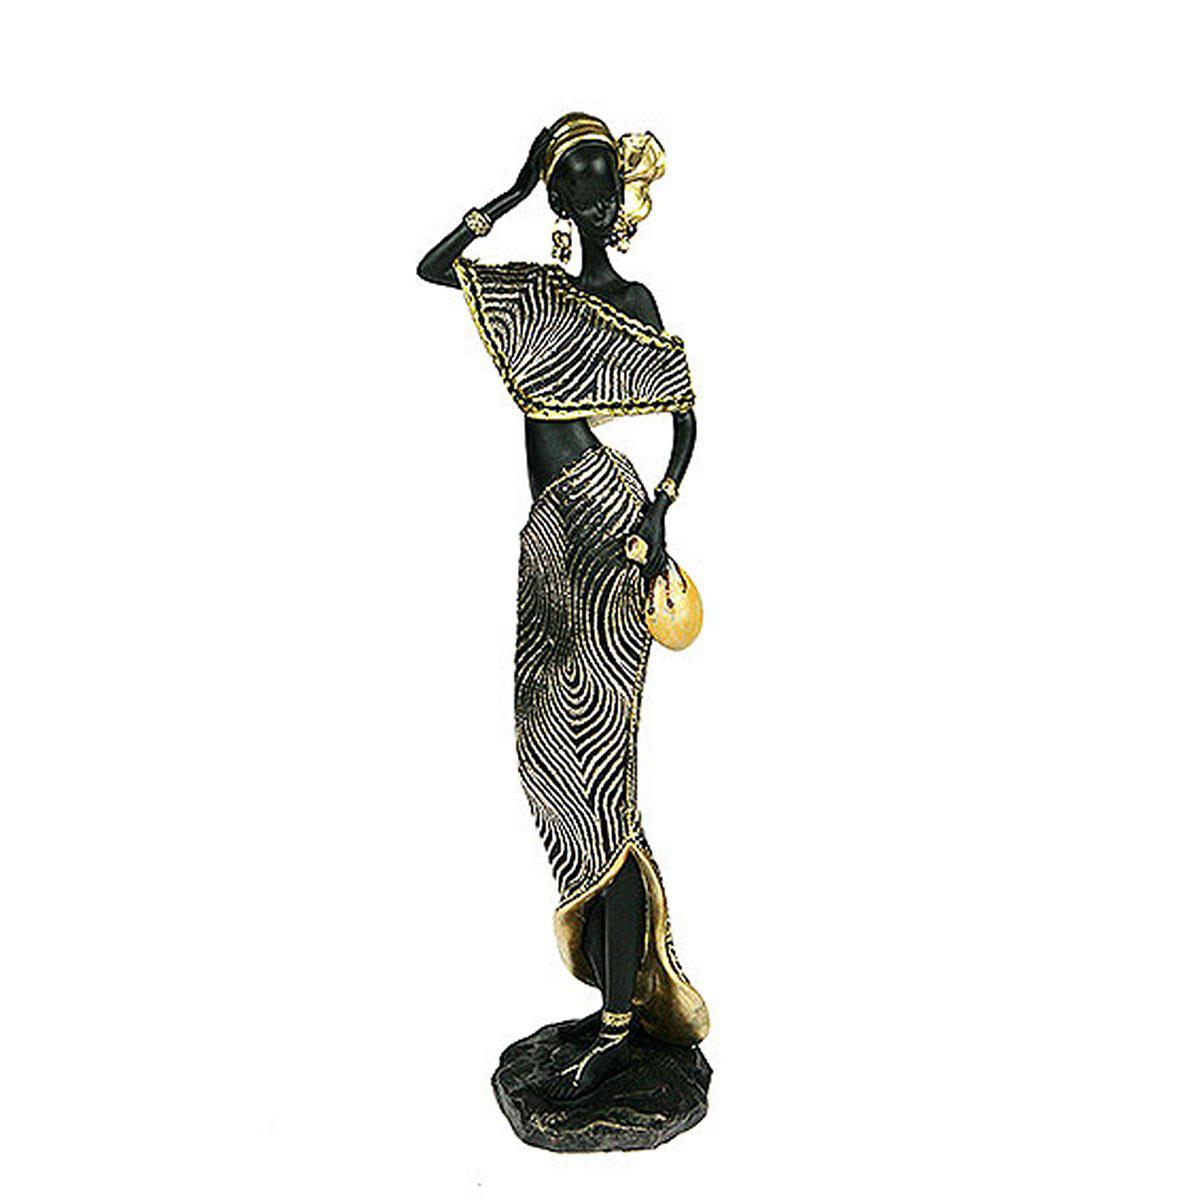 Статуэтка Русские Подарки Африканка, 10 х 10 х 38 см статуэтка lefard африканка 174 311